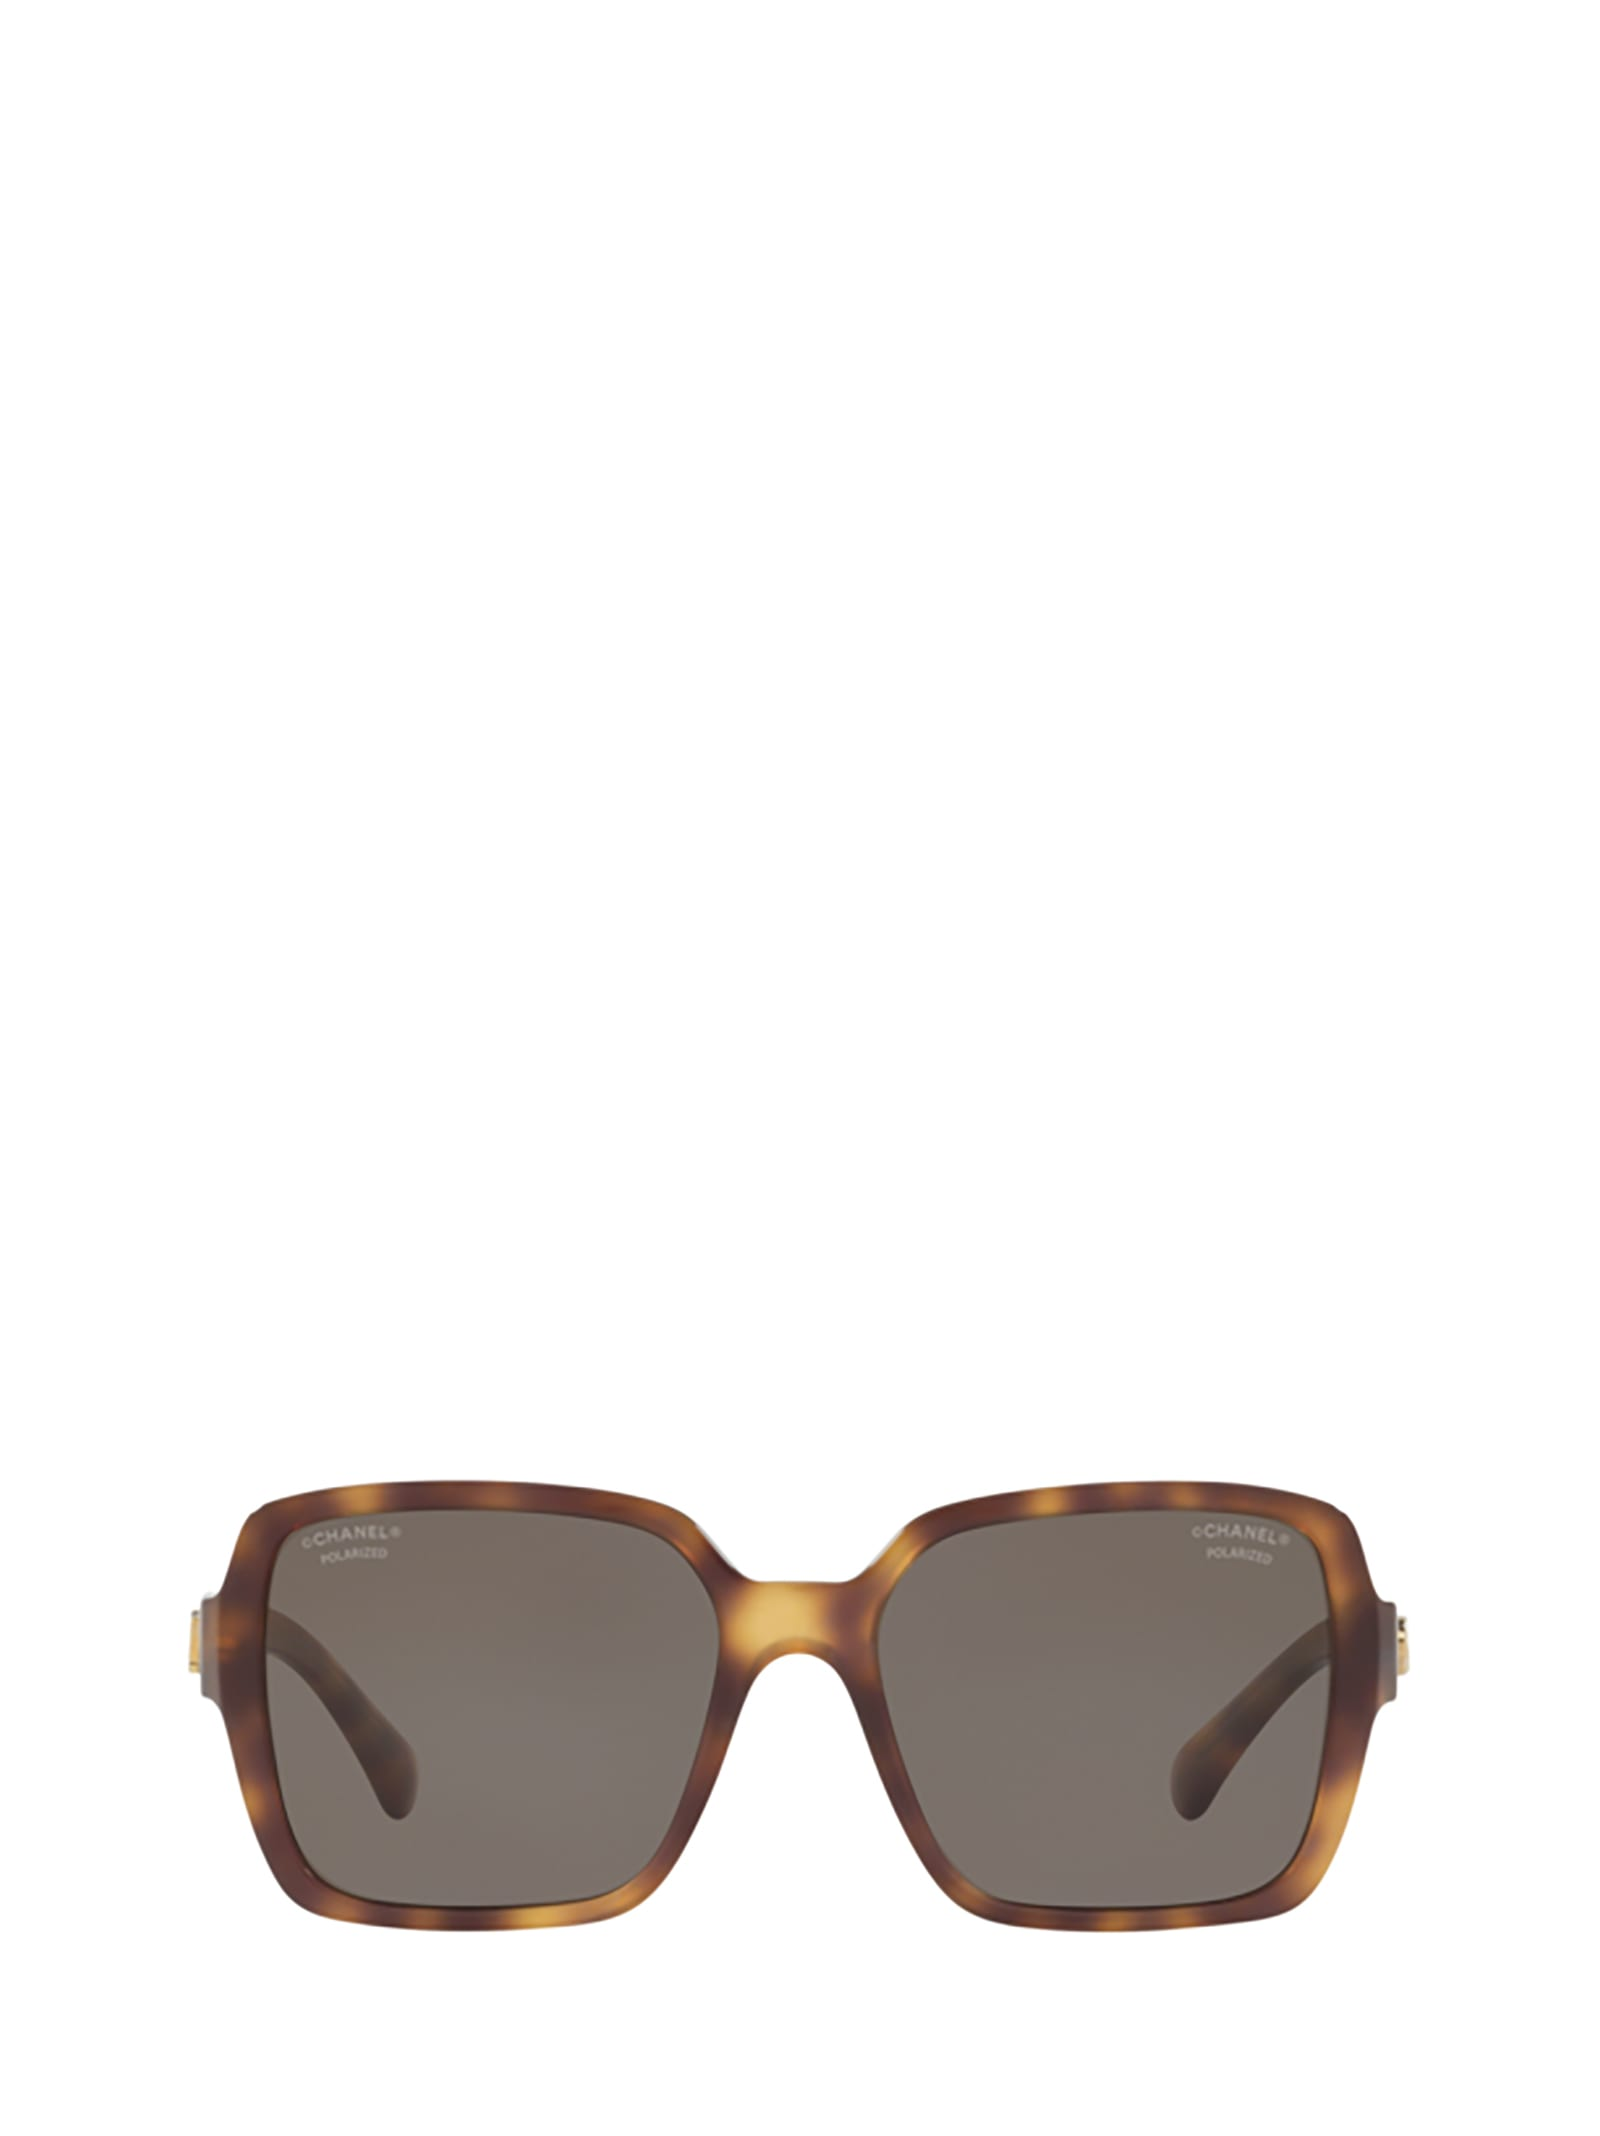 Chanel Chanel Ch5408 Brown Havana Sunglasses